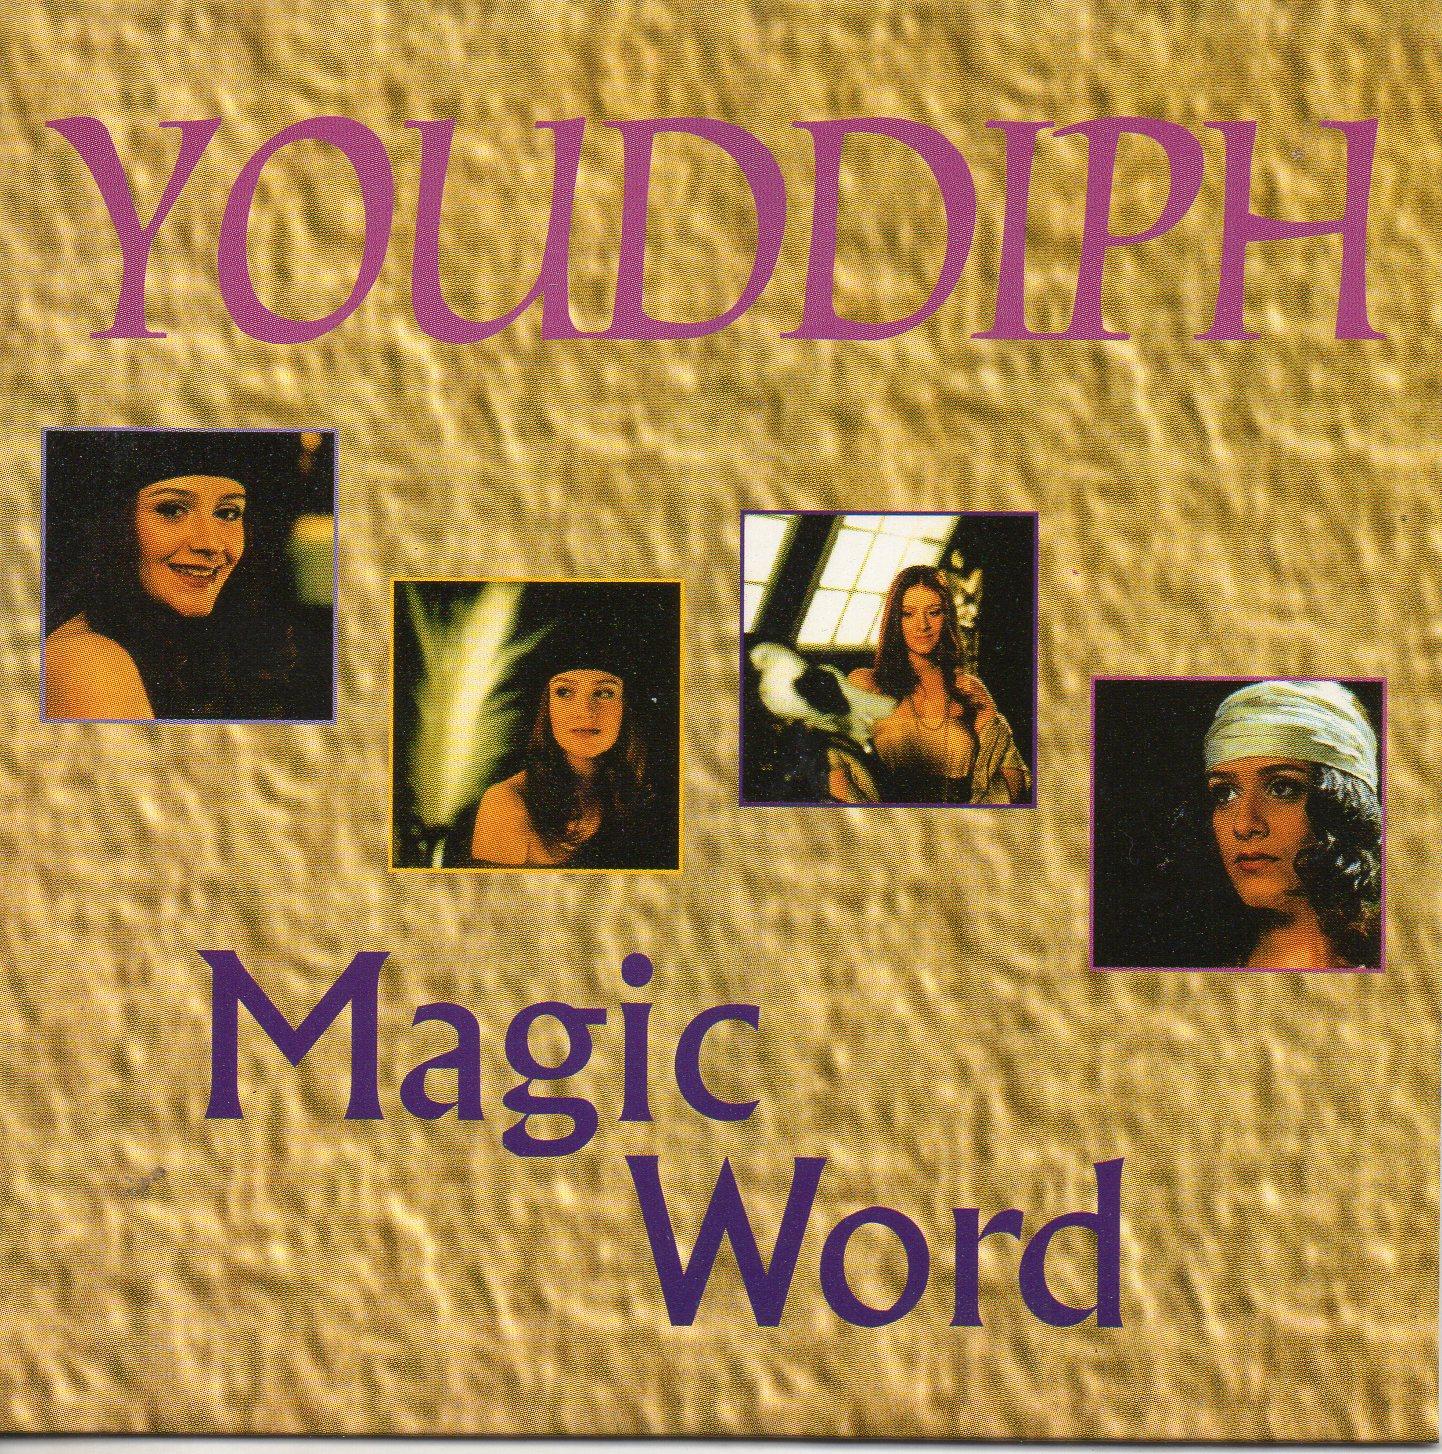 EUROVISION 1994 RUSSIE : YOUDDIPH - Magic Word 2-track CARD SLEEVE - CD single